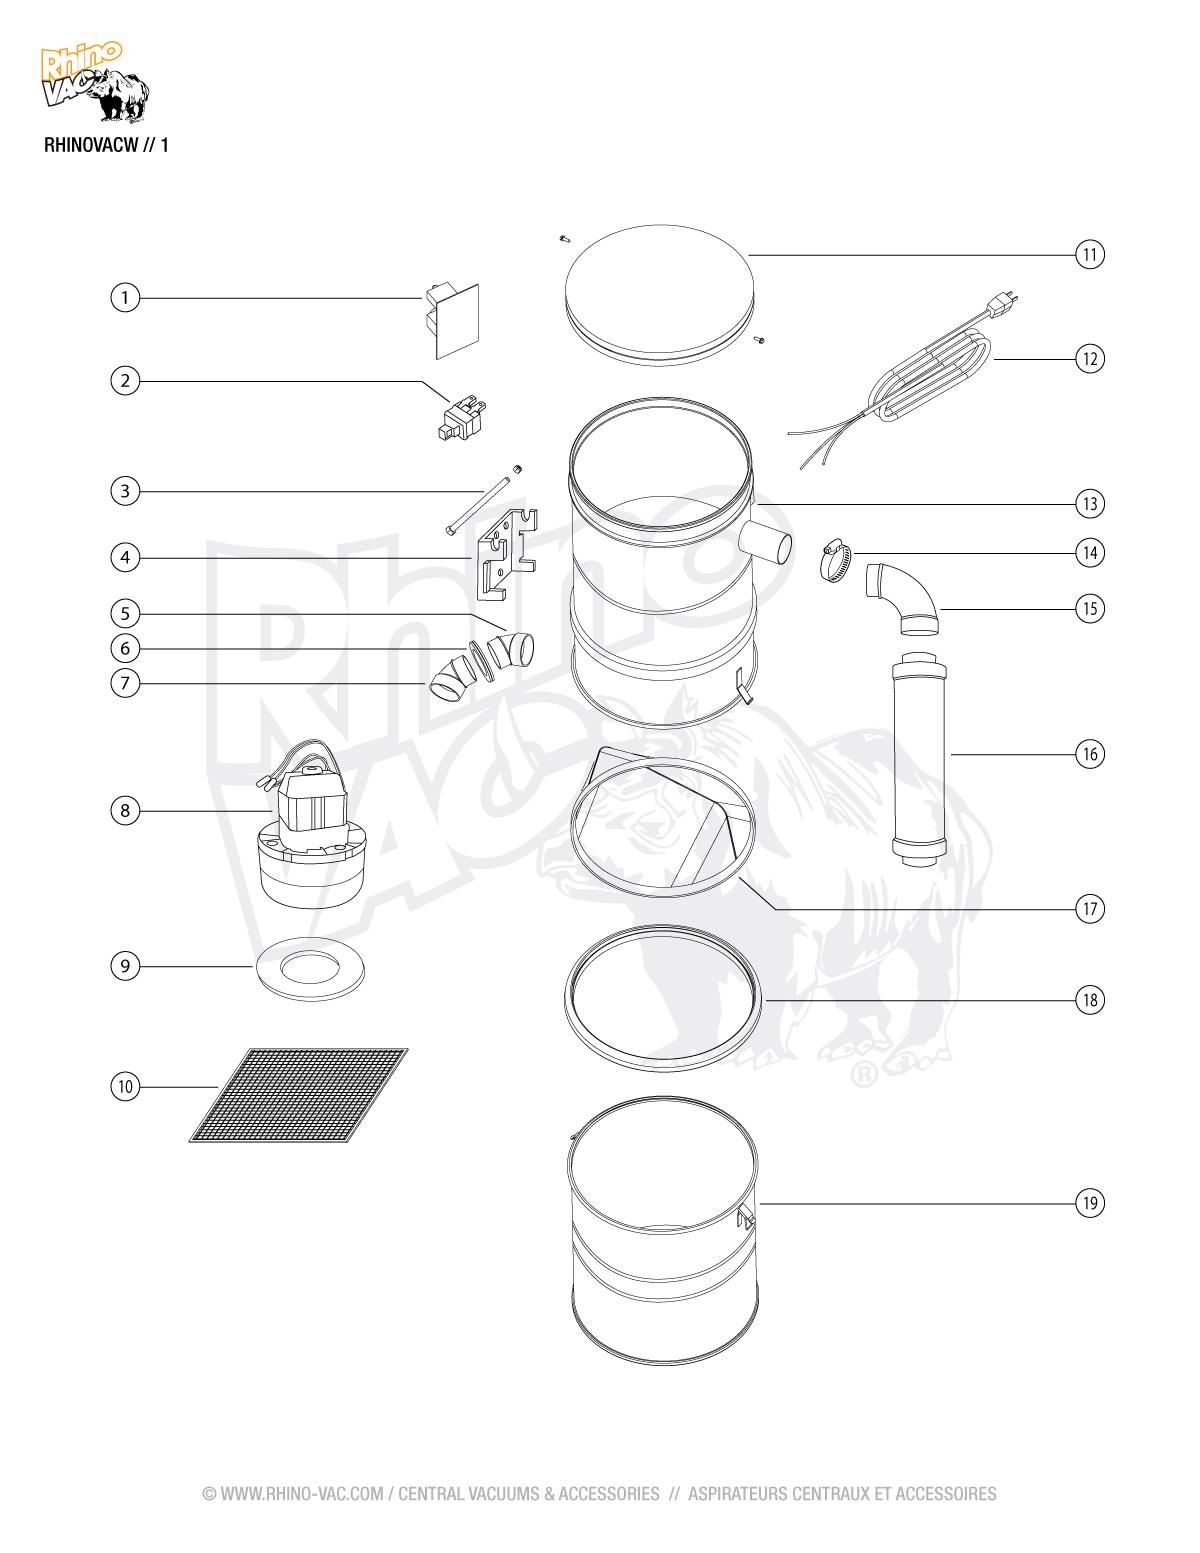 Parts for RHINOVACW